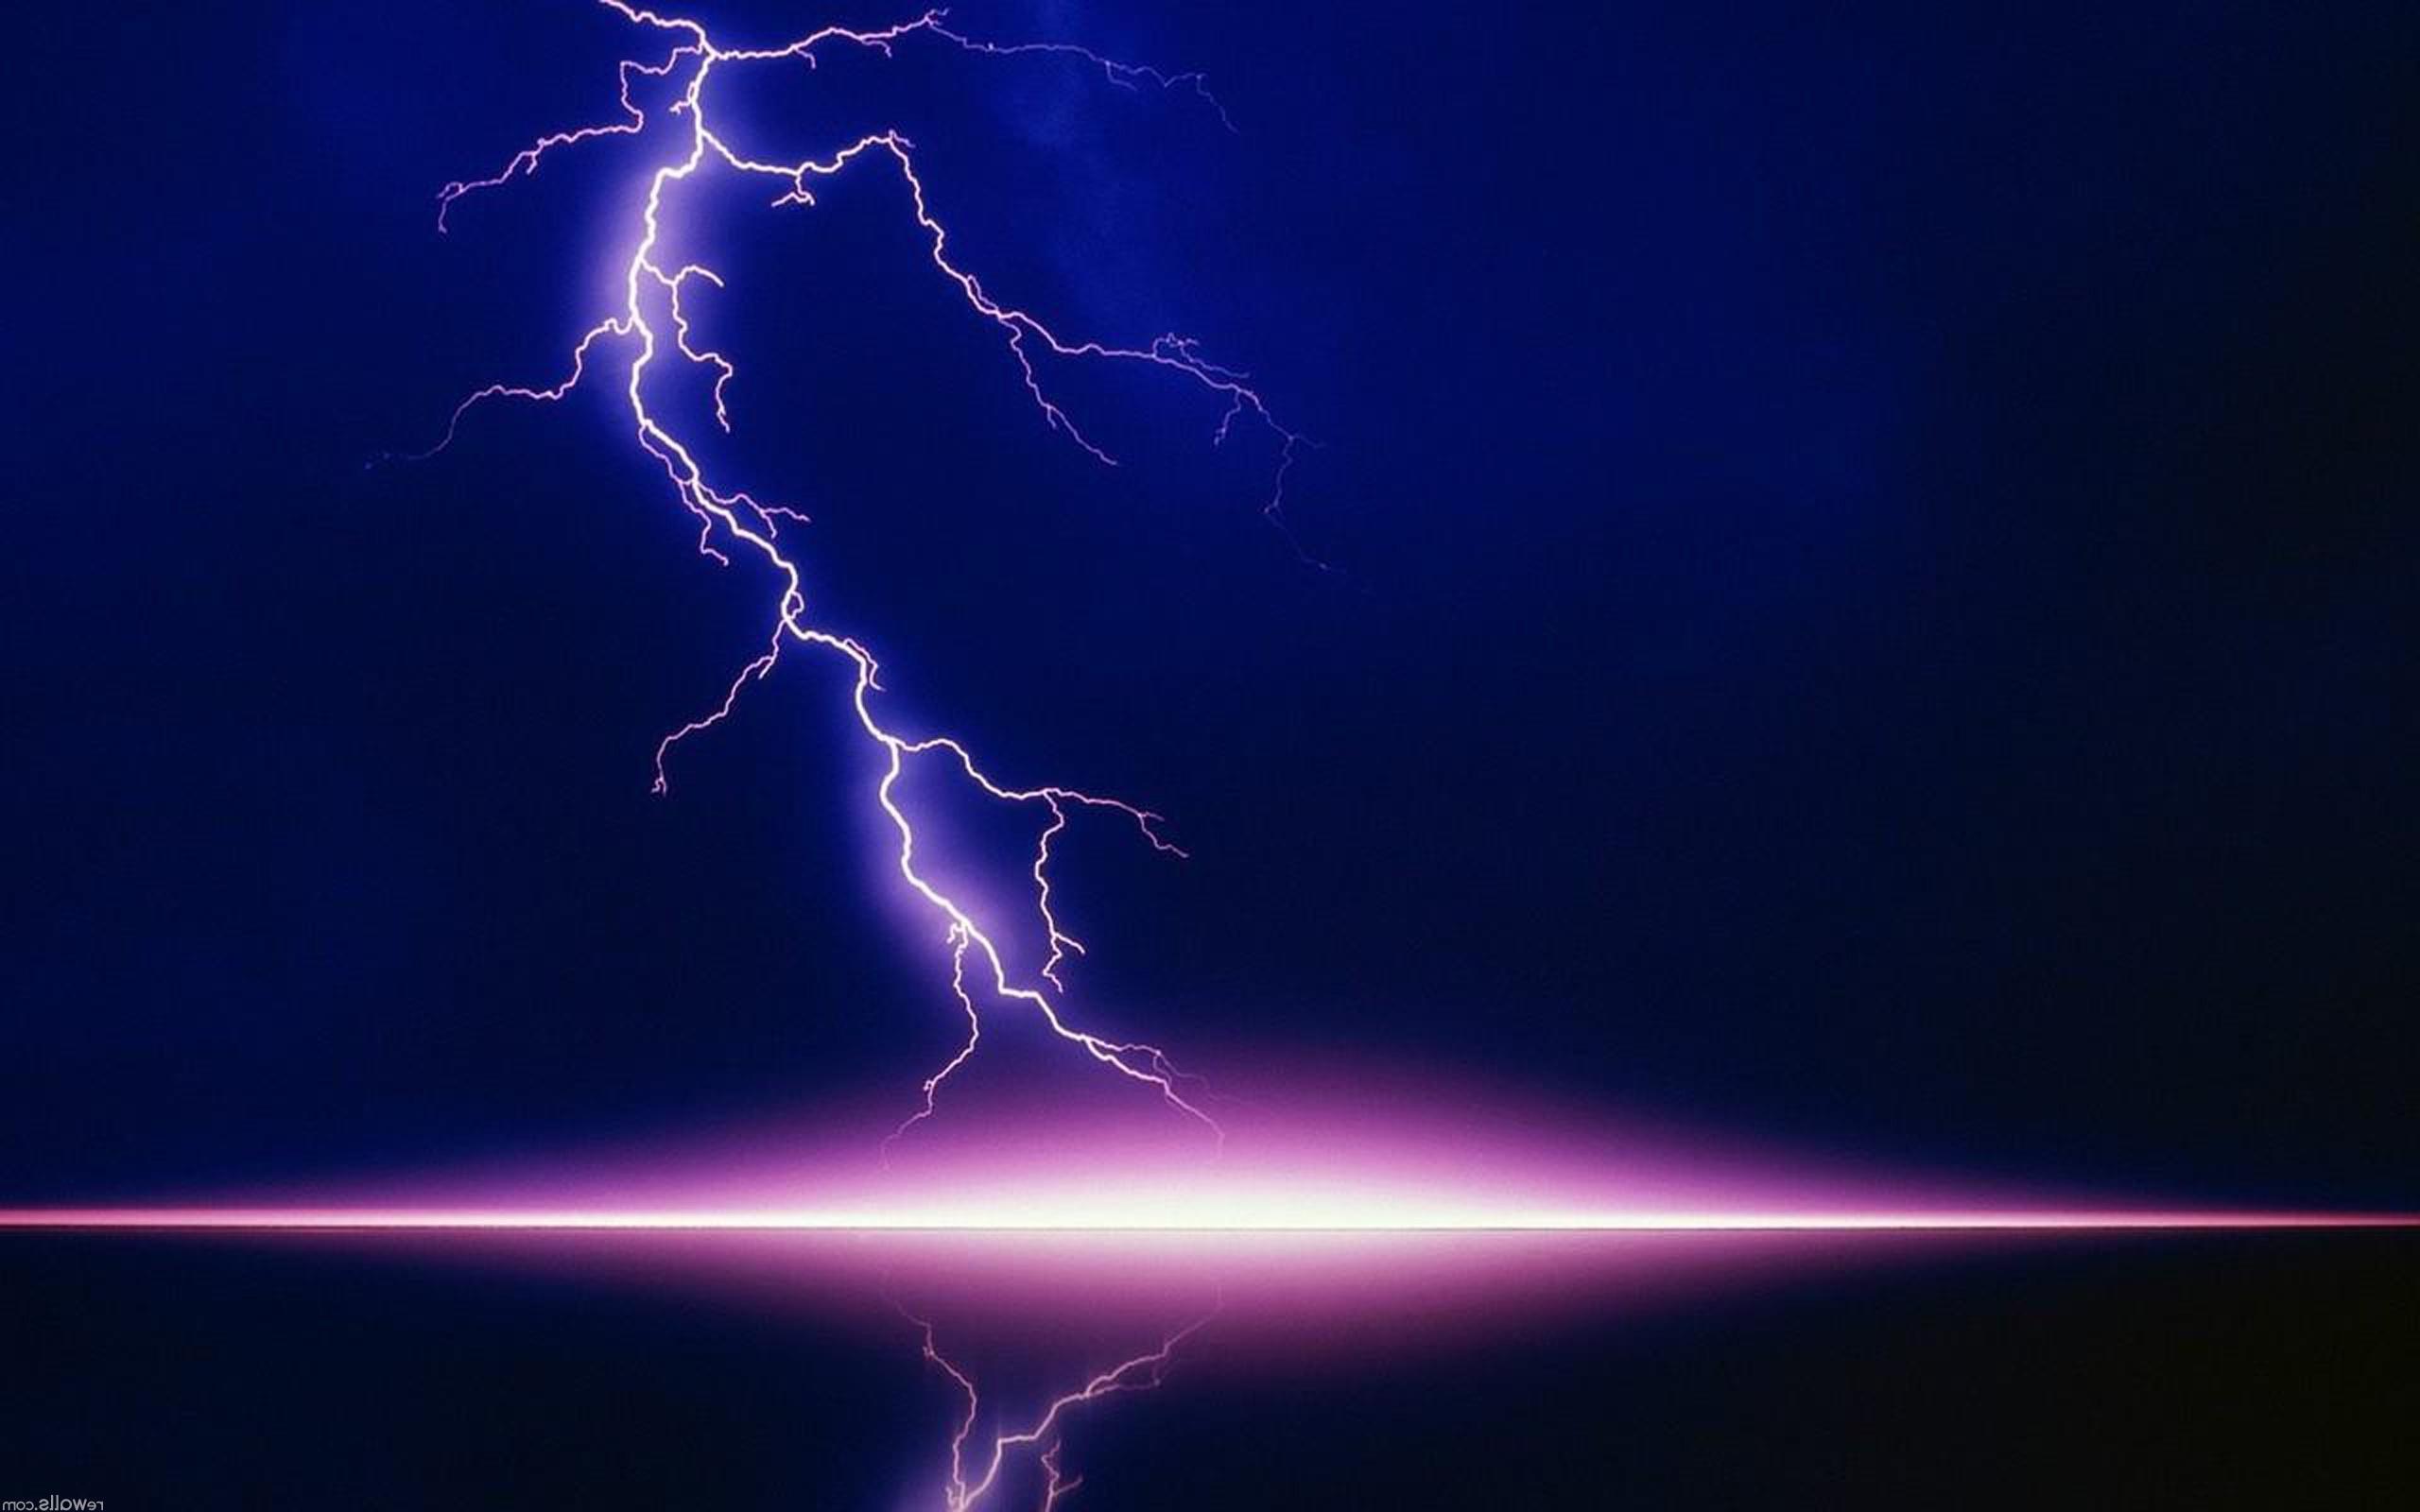 Lightning Bolt Wallpaper 45 Pictures